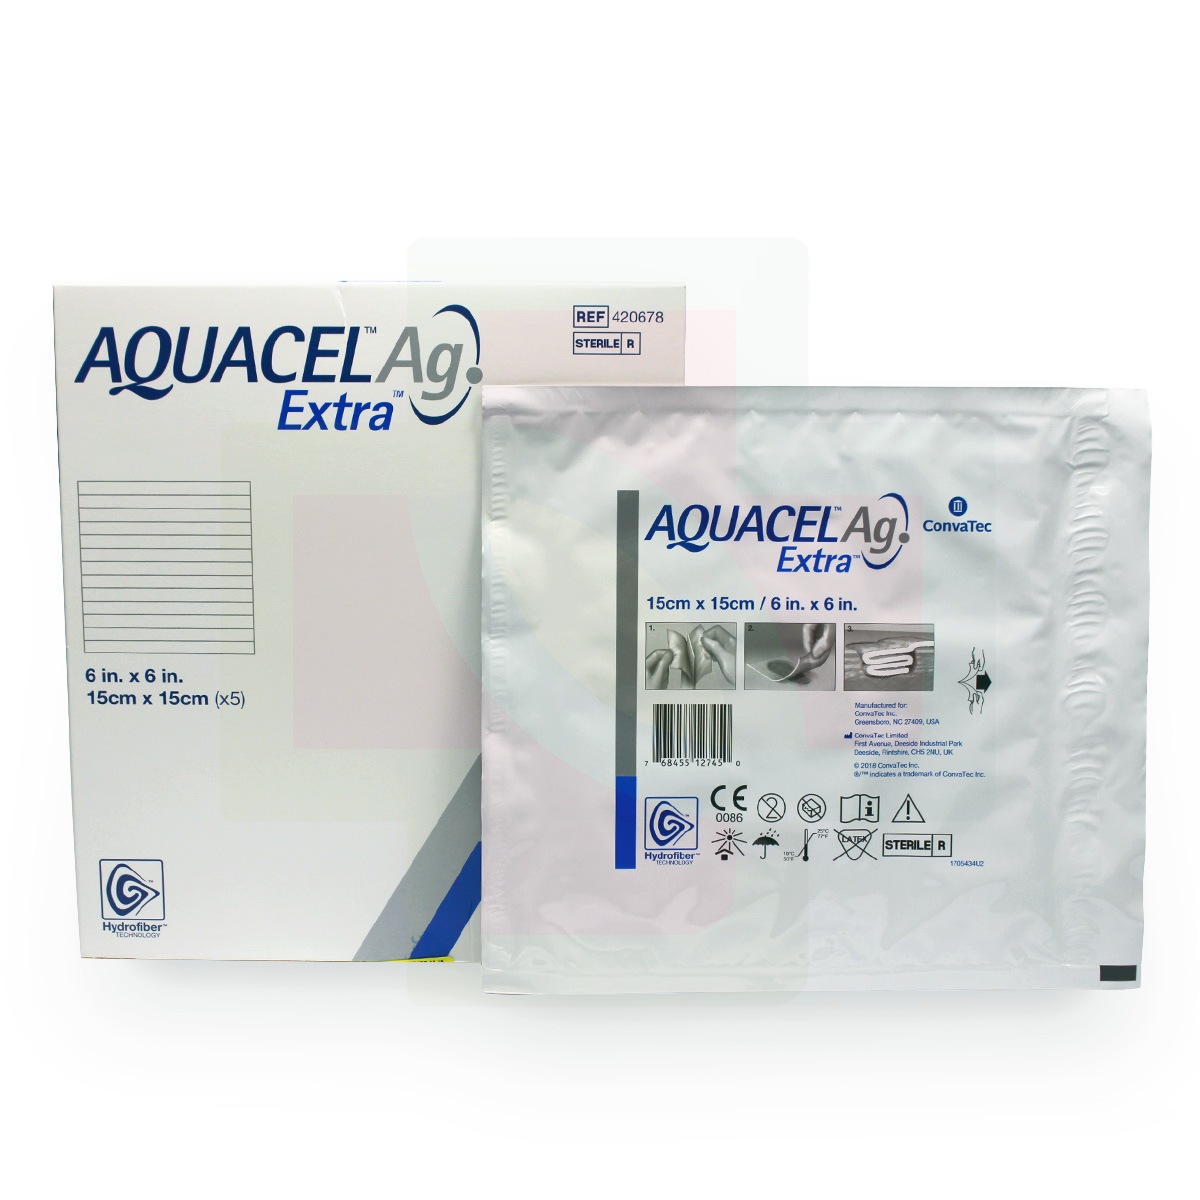 CURATIVO AQUACEL EXTRA AG 15 X 15 CM UND. 420678 - CONVATEC